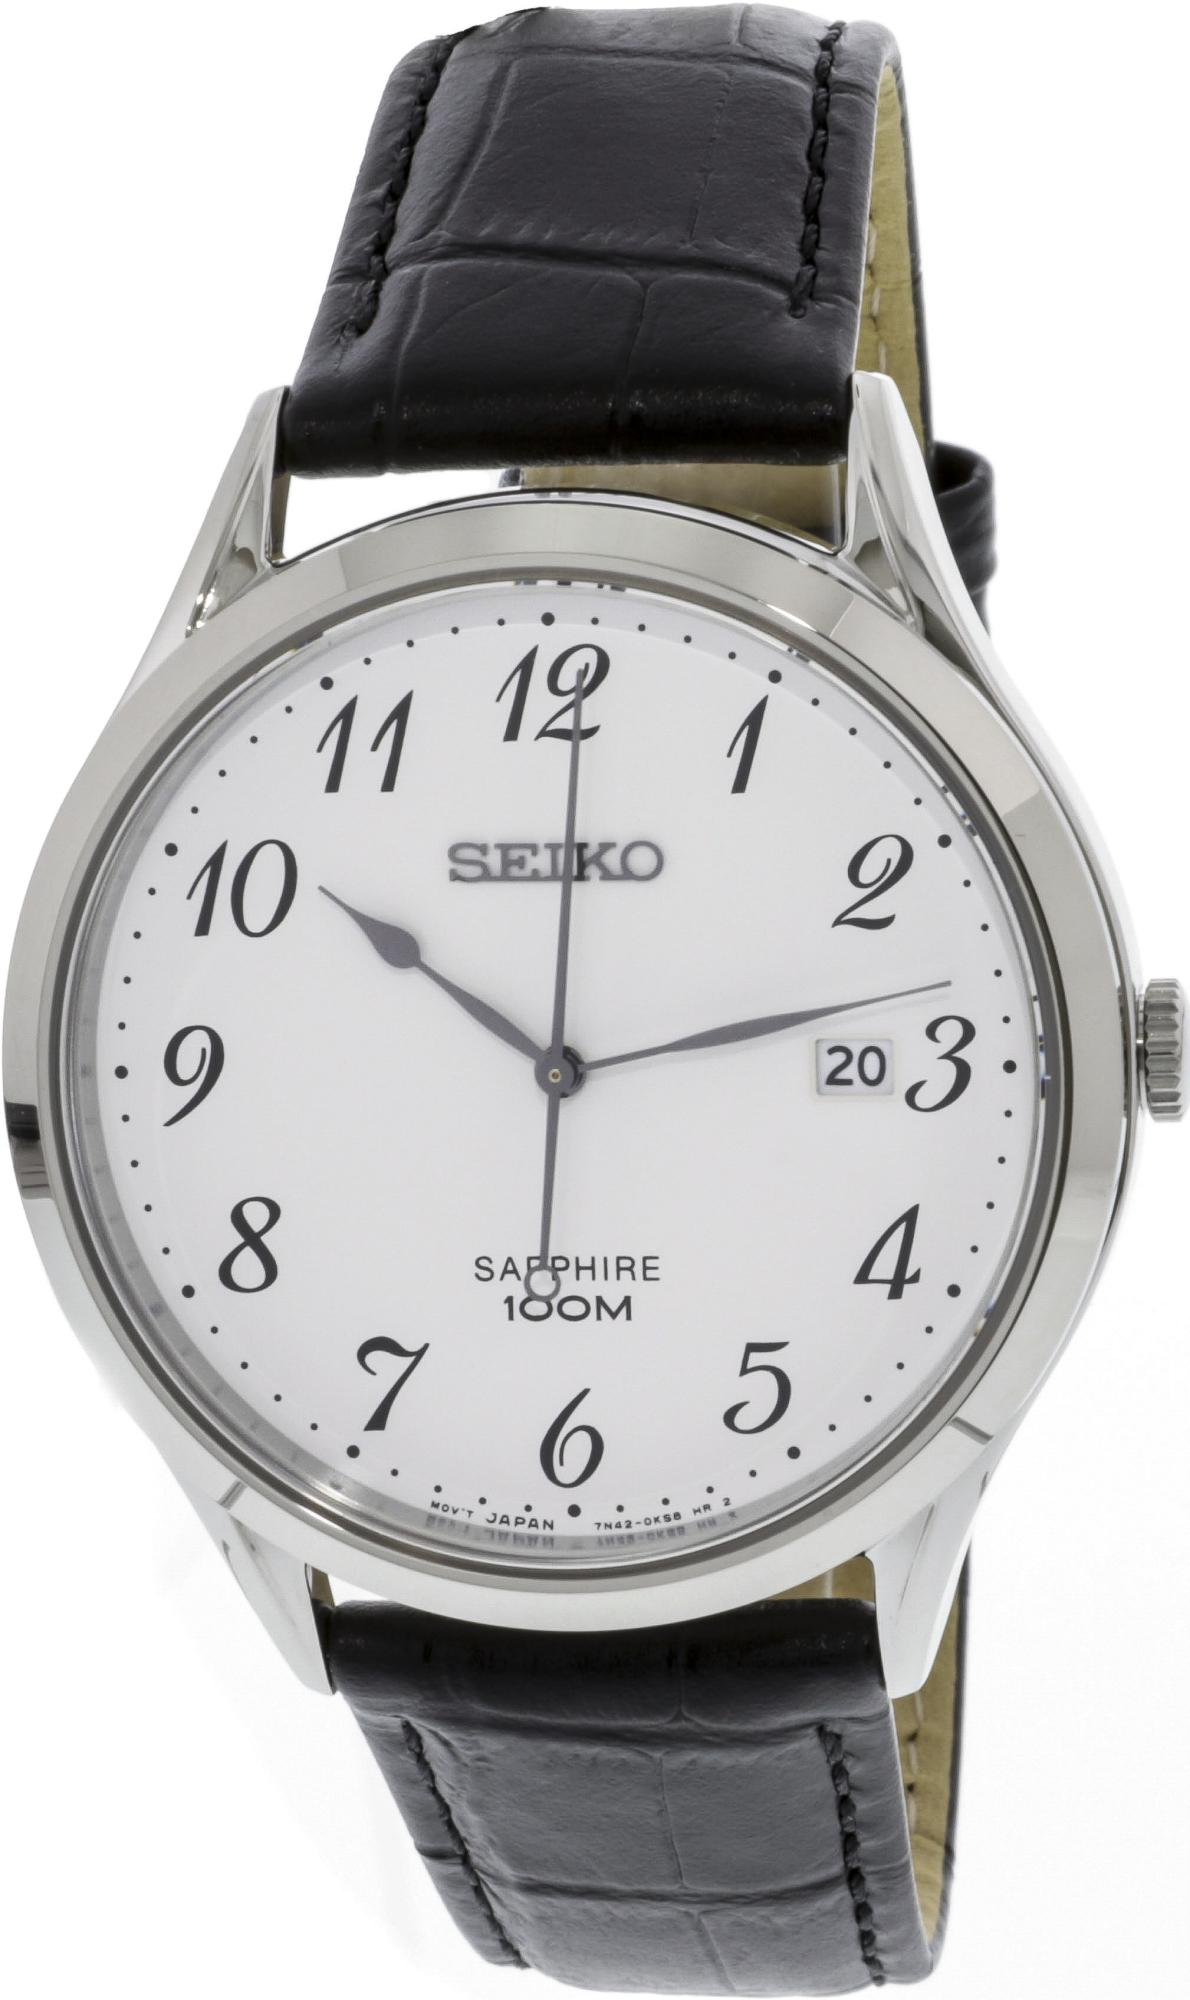 Seiko_Men's_SGEH75_Silver_Leather_Japanese_Quartz_Diving_Watch